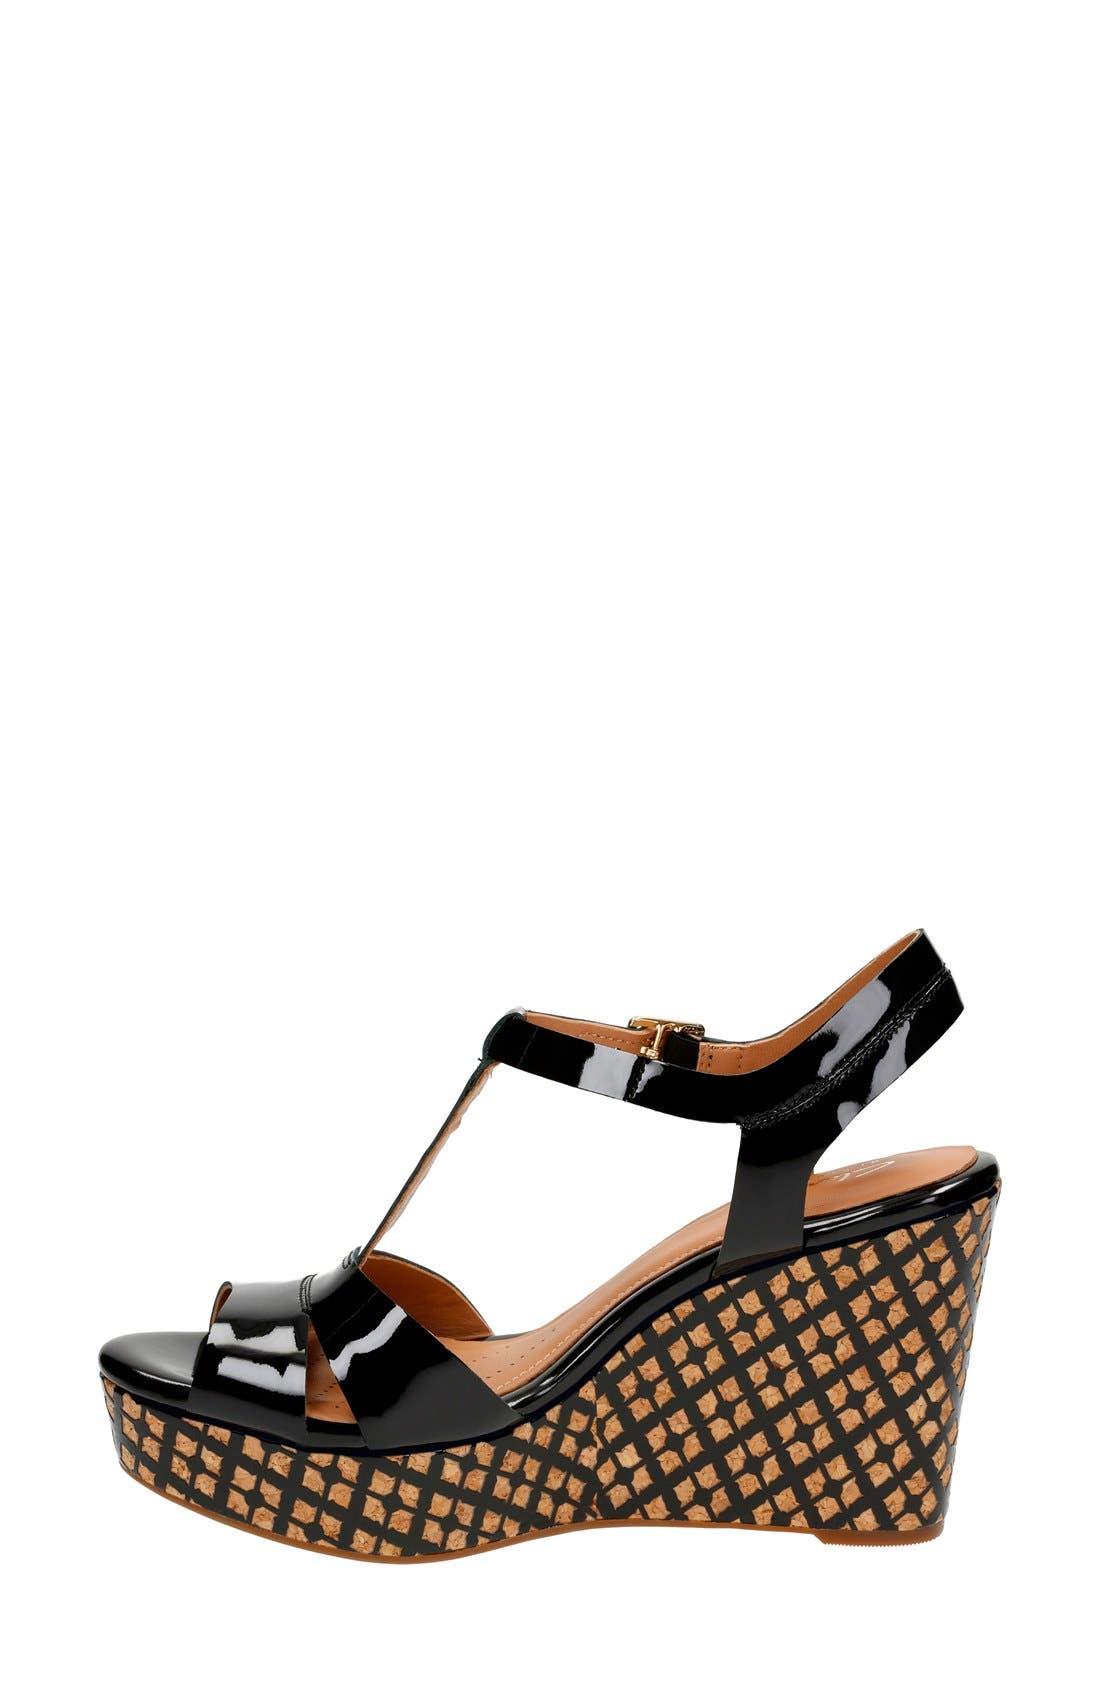 'Amelia Roma' Wedge Sandal,                             Alternate thumbnail 2, color,                             017